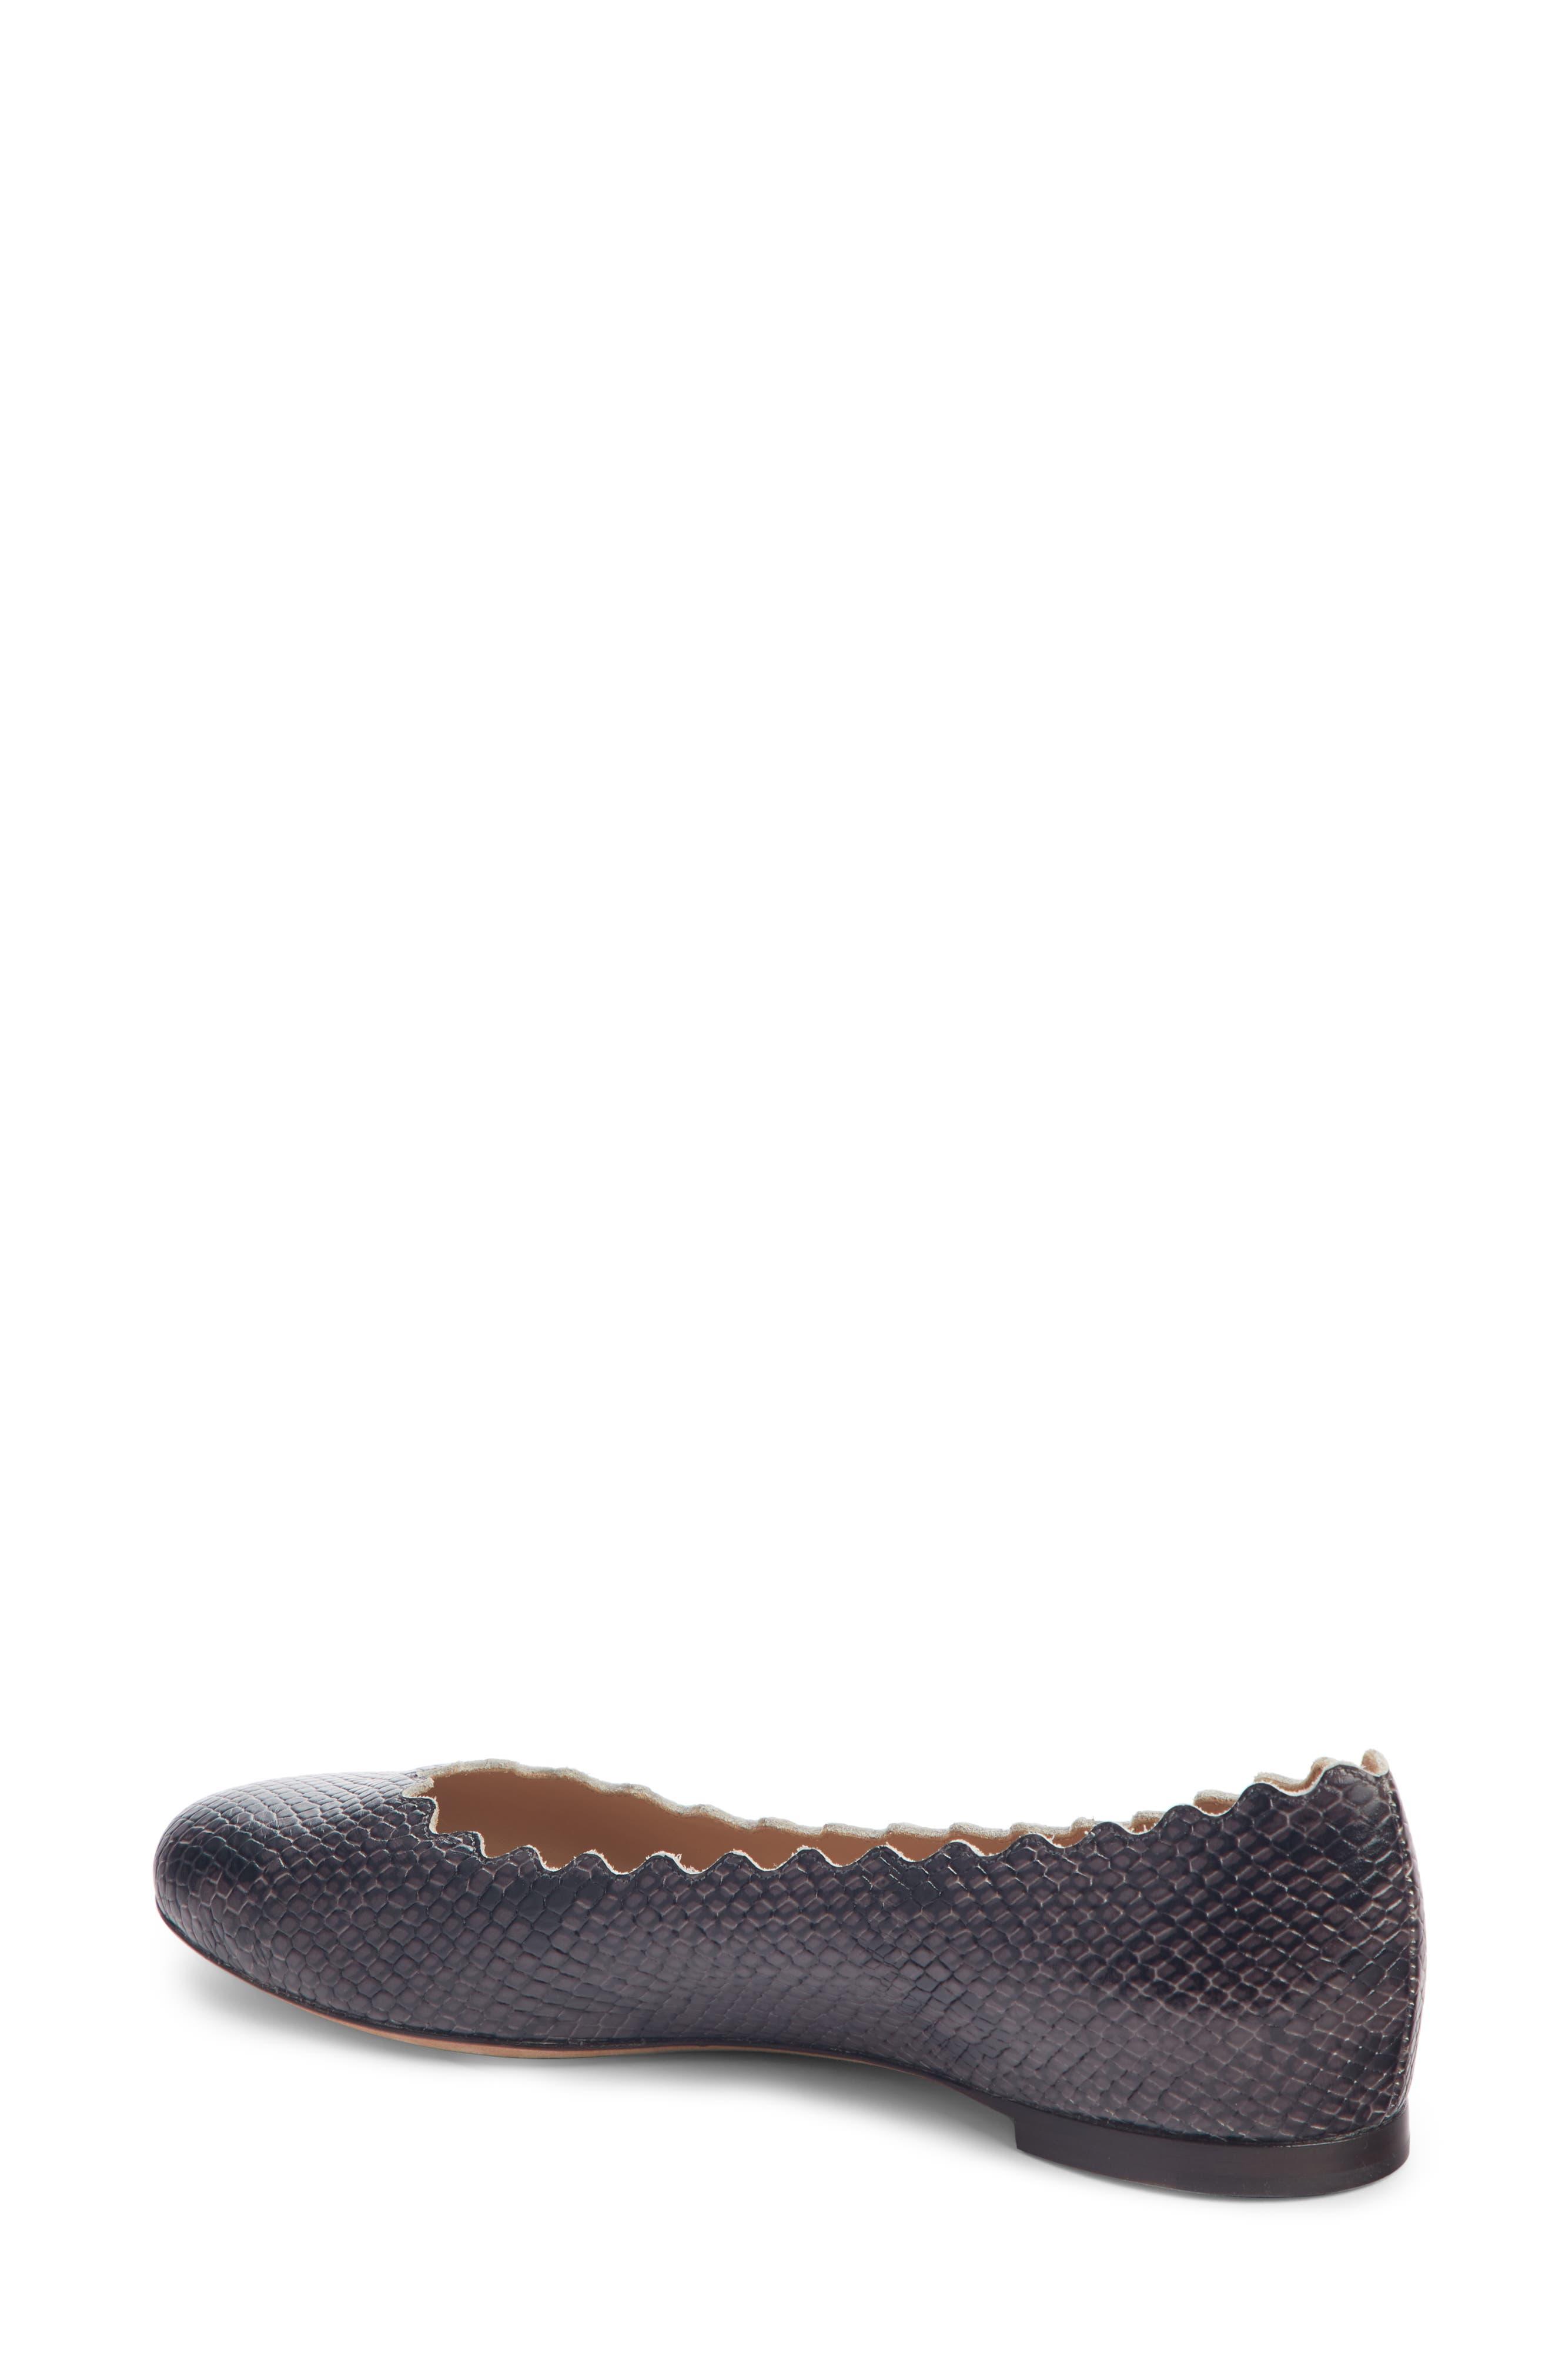 4b4bce8f6d8 Chloé Women s Flats Shoes